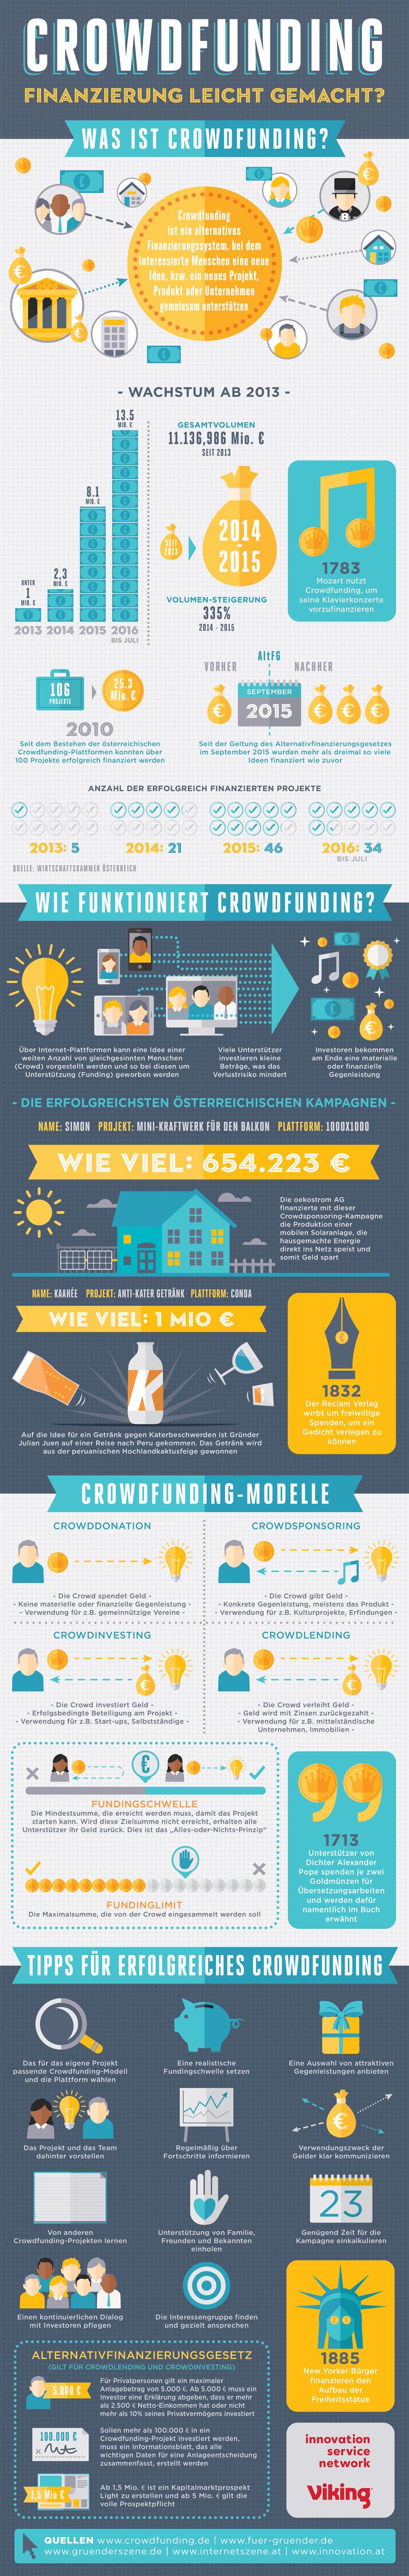 crowdfunding-austria